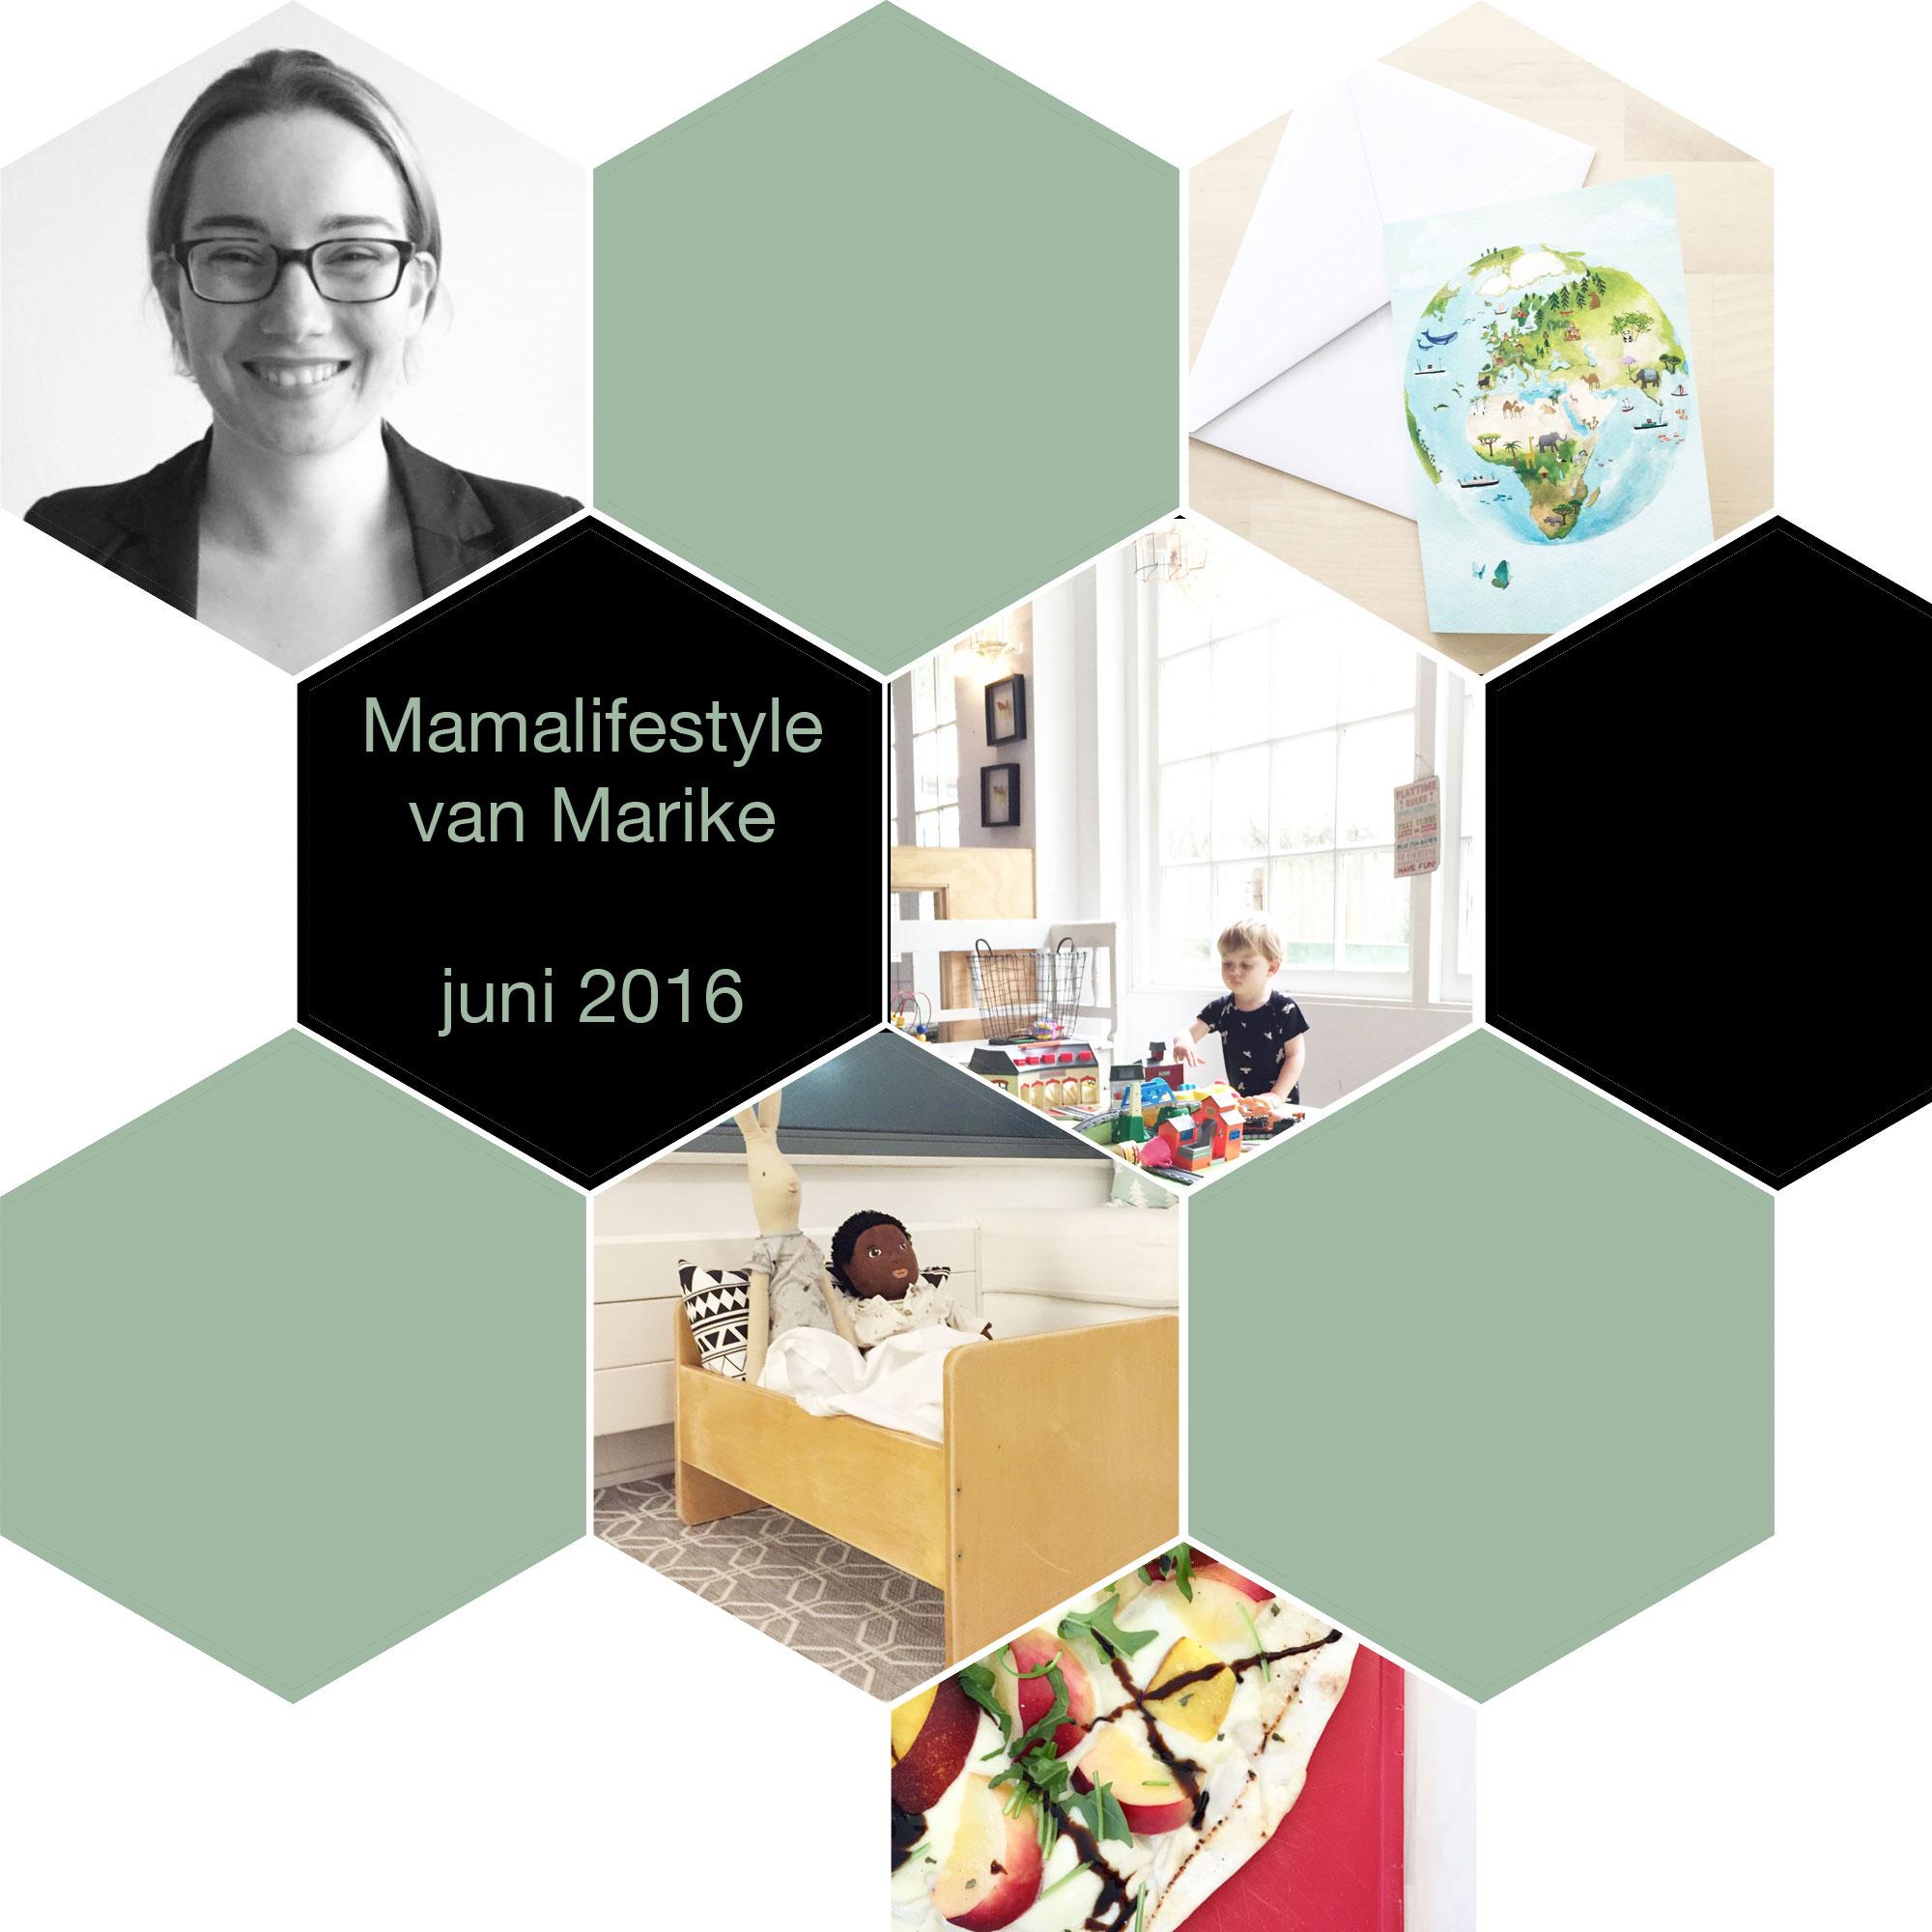 Mamalifestyle maandoverzicht juni 2016